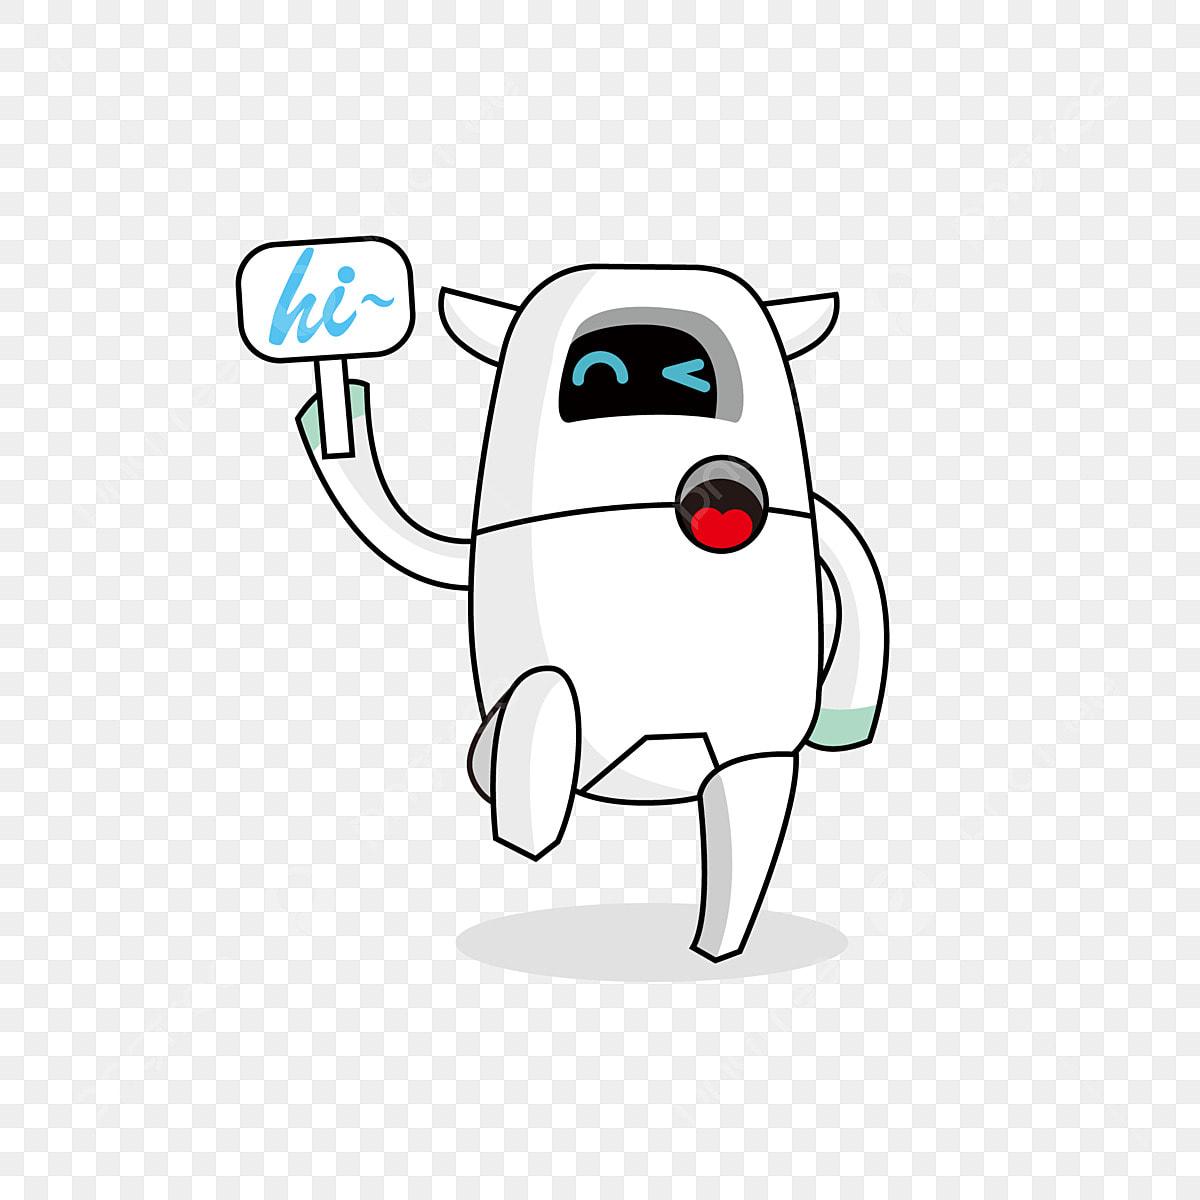 Dibujos Animados Lindo Robot Clipart Gratis Dibujos Animados